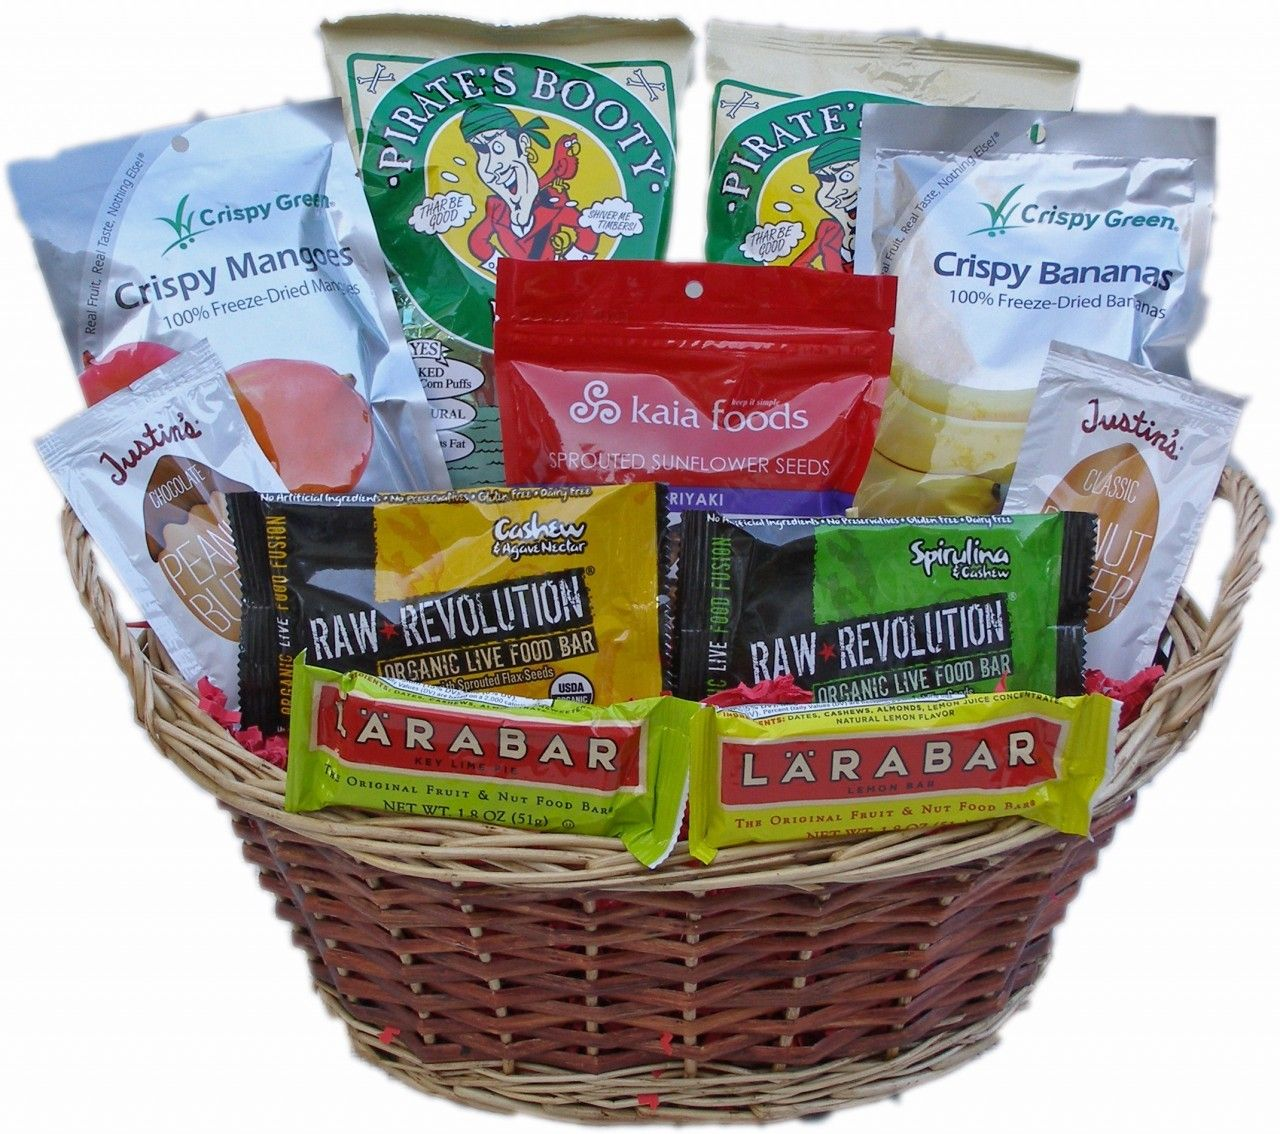 Gluten free vegan gift basket with images